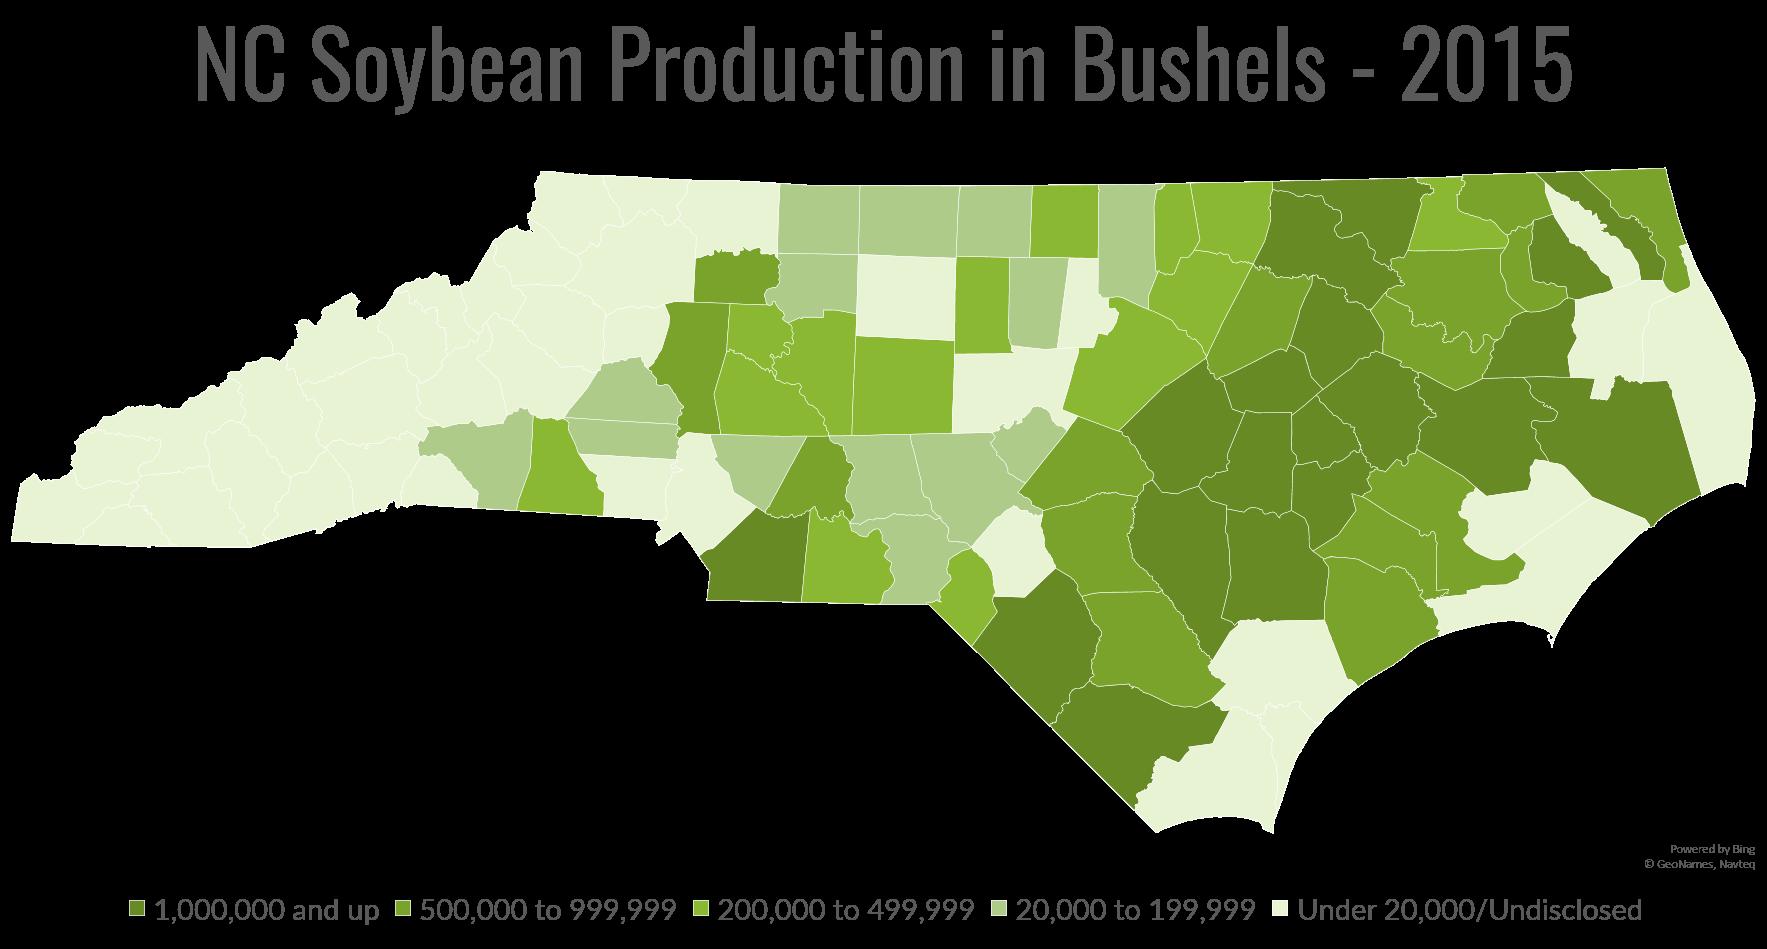 North Carolina Soybeans - North Carolina Soybeans